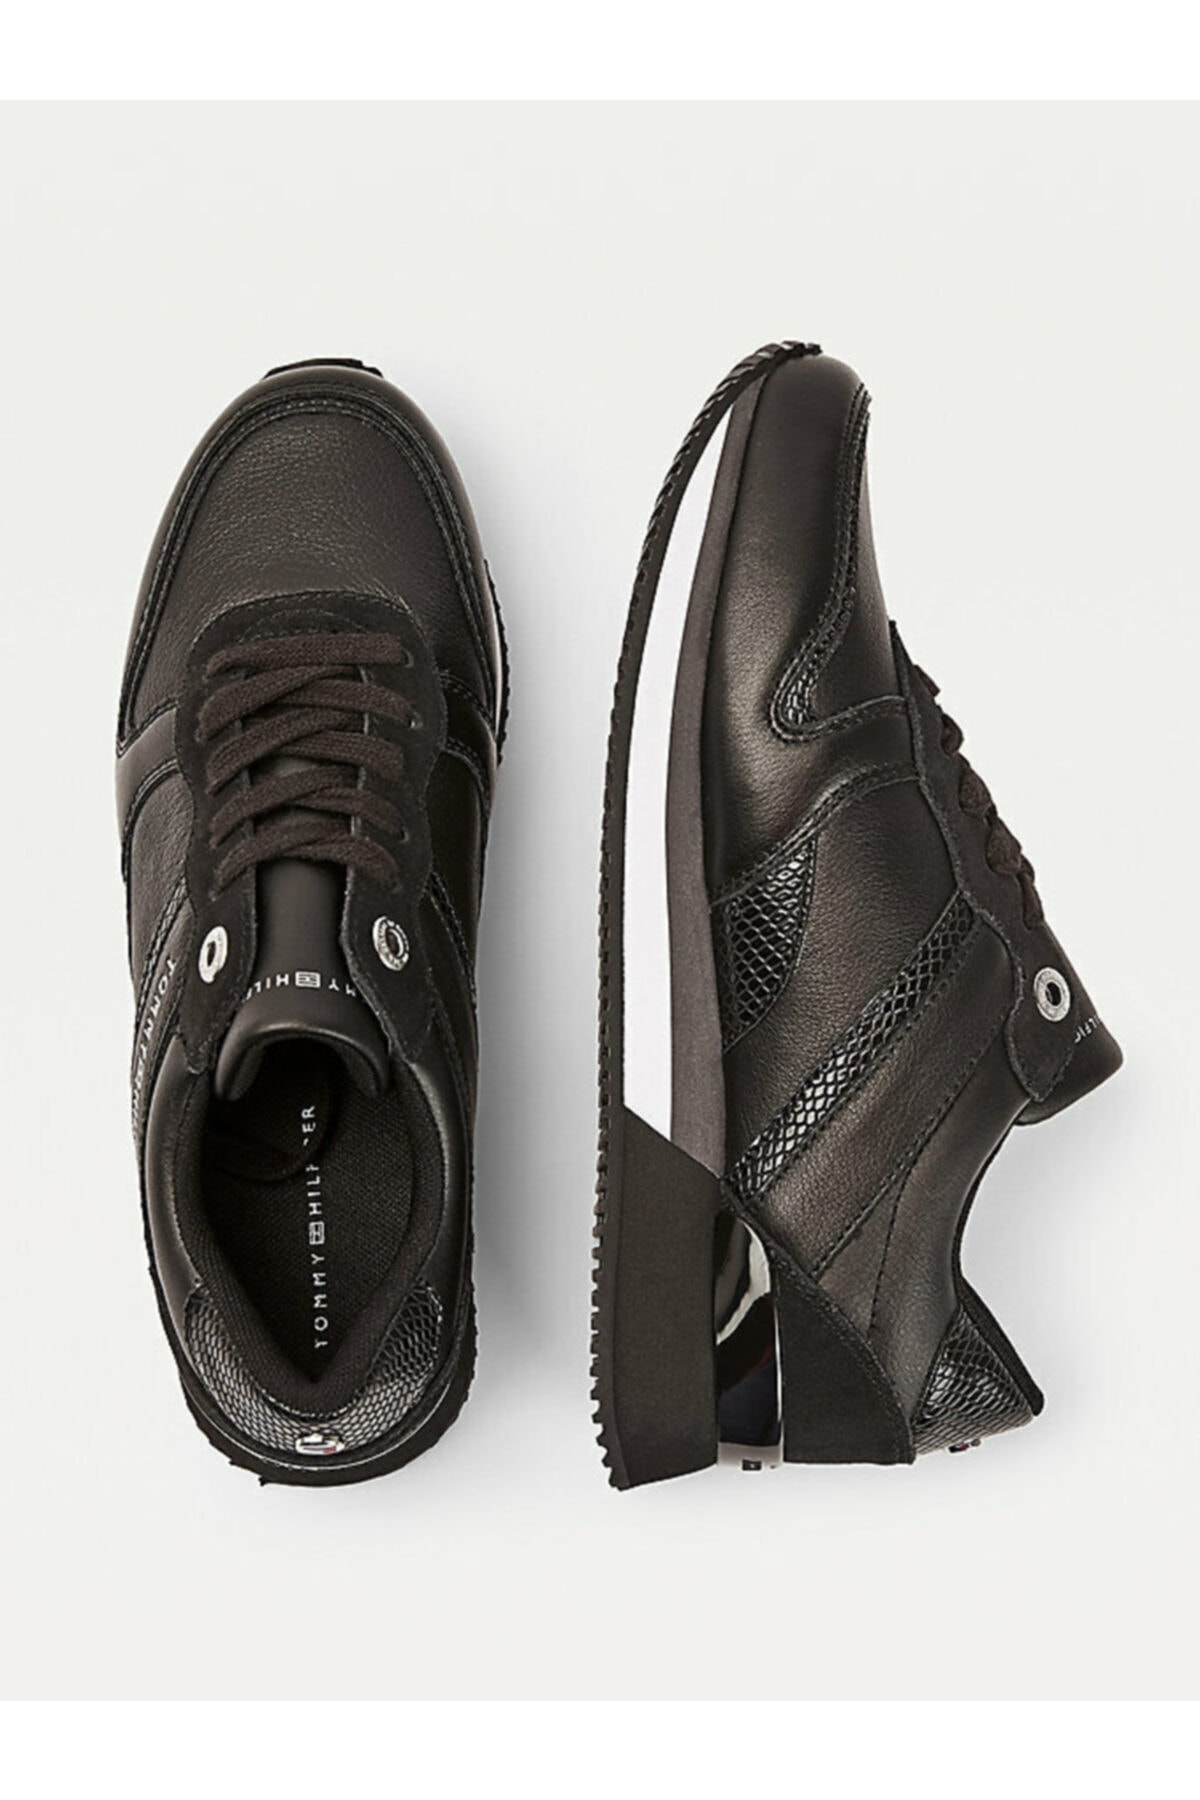 Tommy Hilfiger Kadın Siyah Sneaker Corporate Femınıne Cıty Sneaker FW0FW05233 2